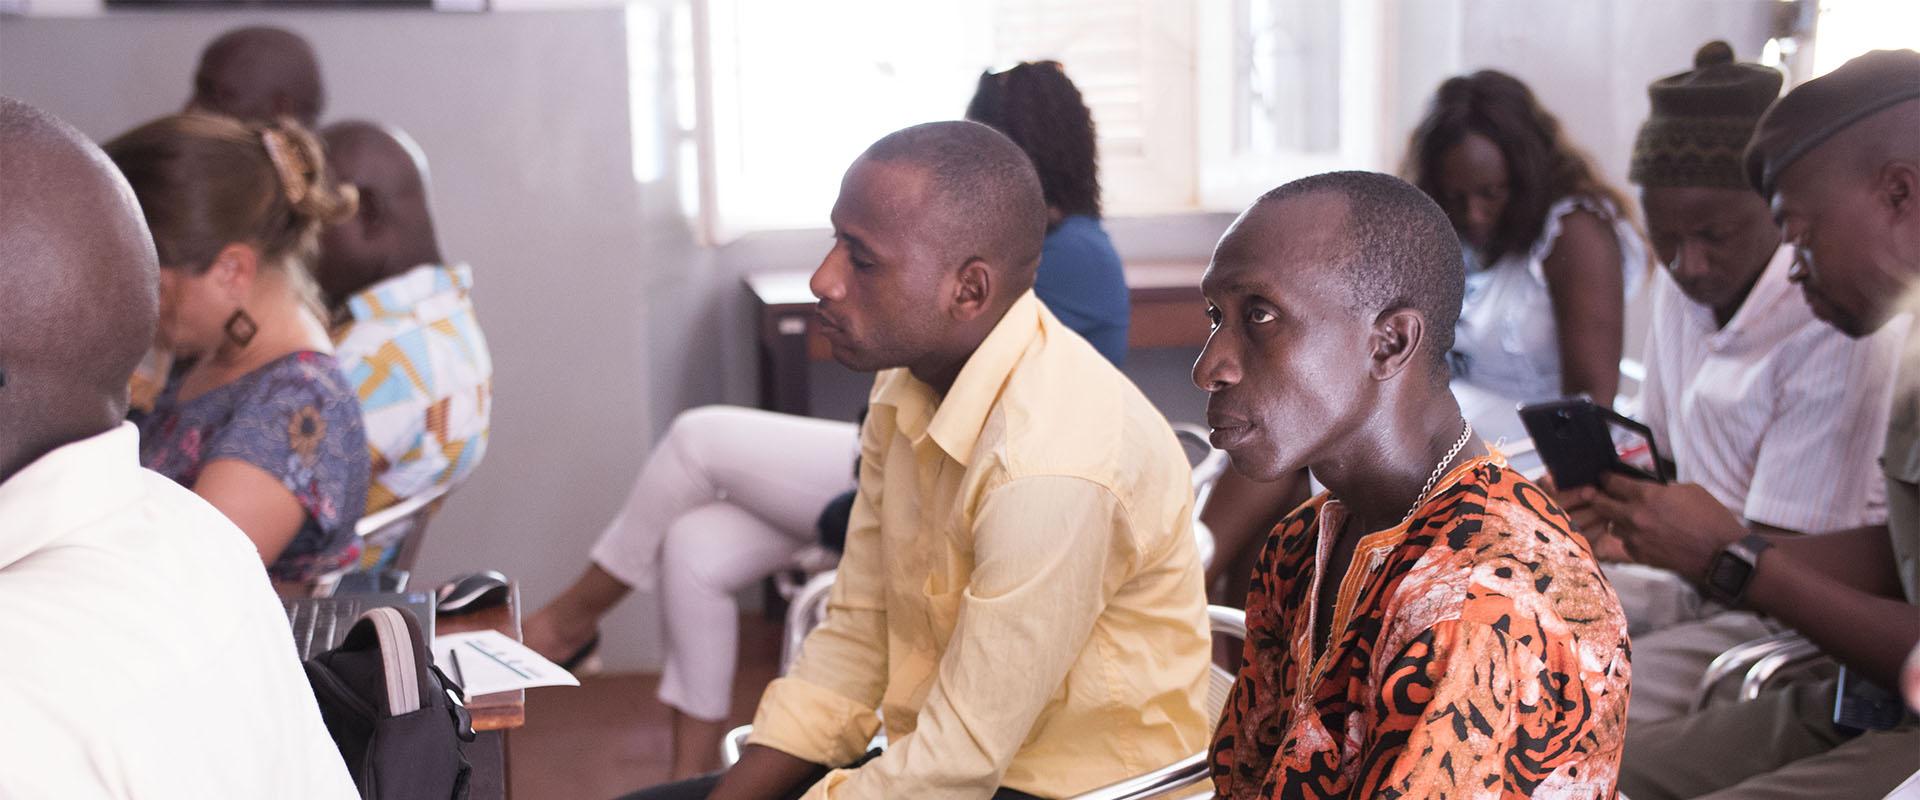 evento carceri spettatori Guinea Bissau Mani Tese 2017